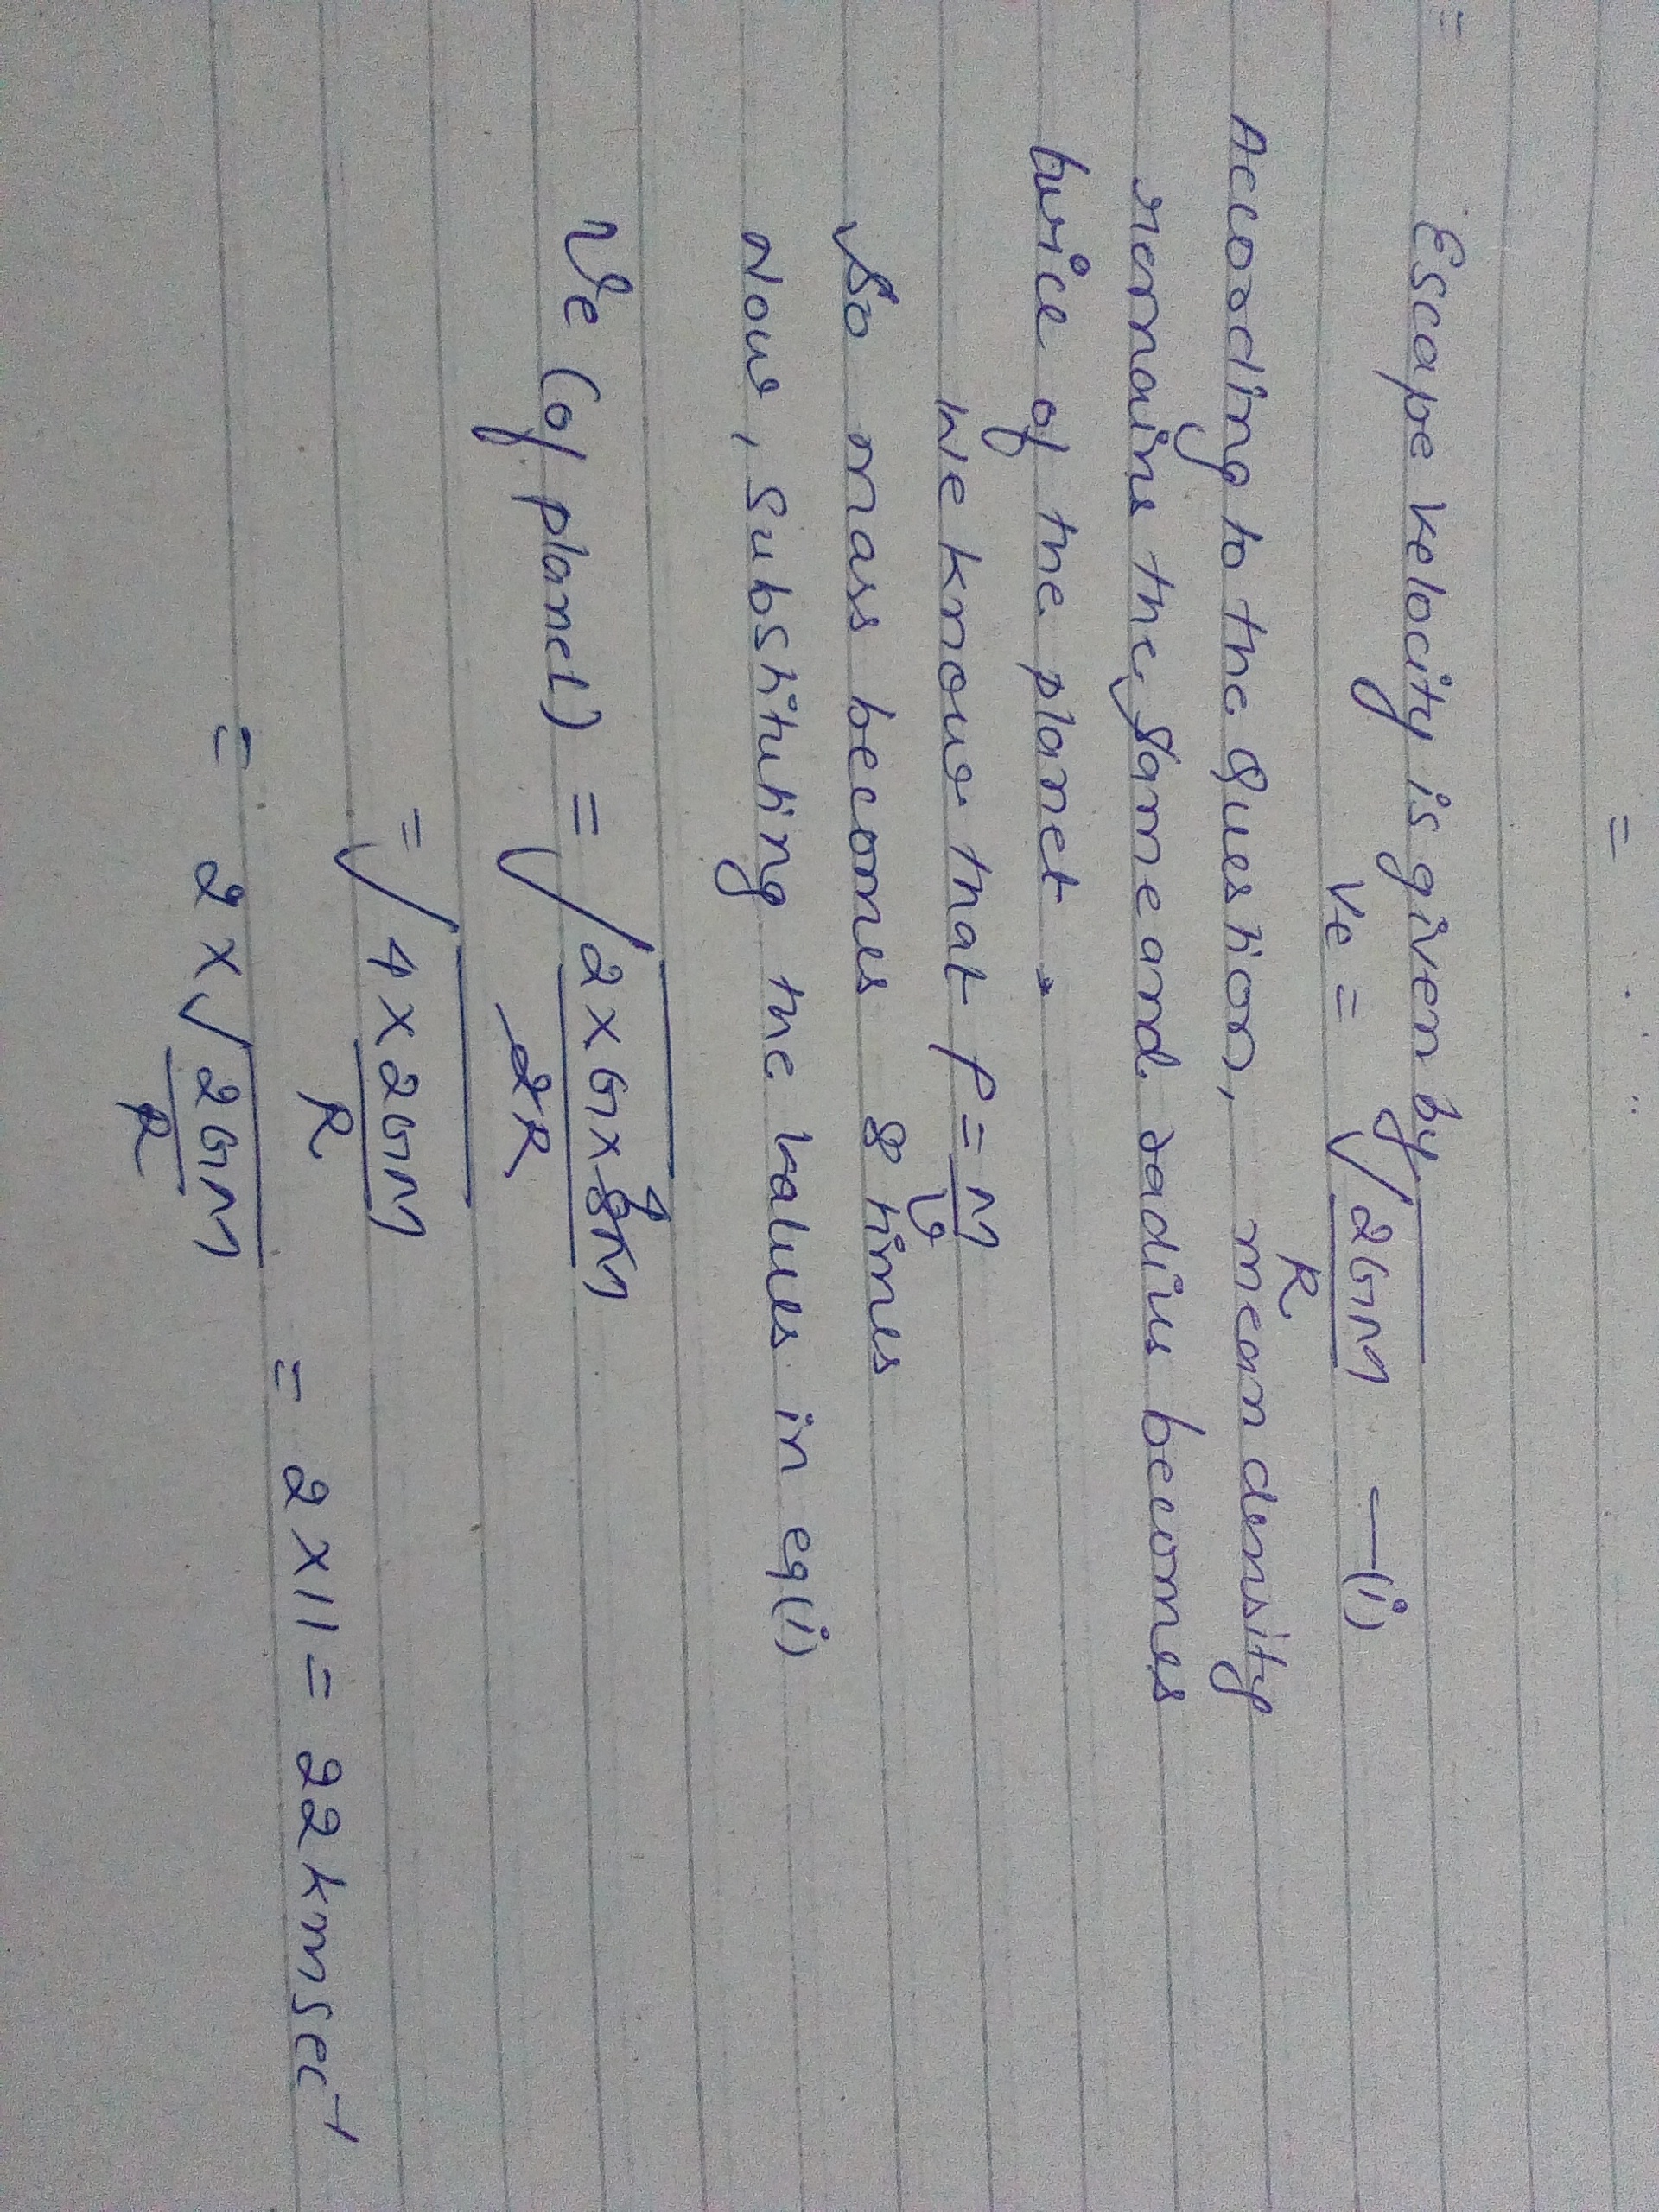 8-2 gravitational acceleration answers